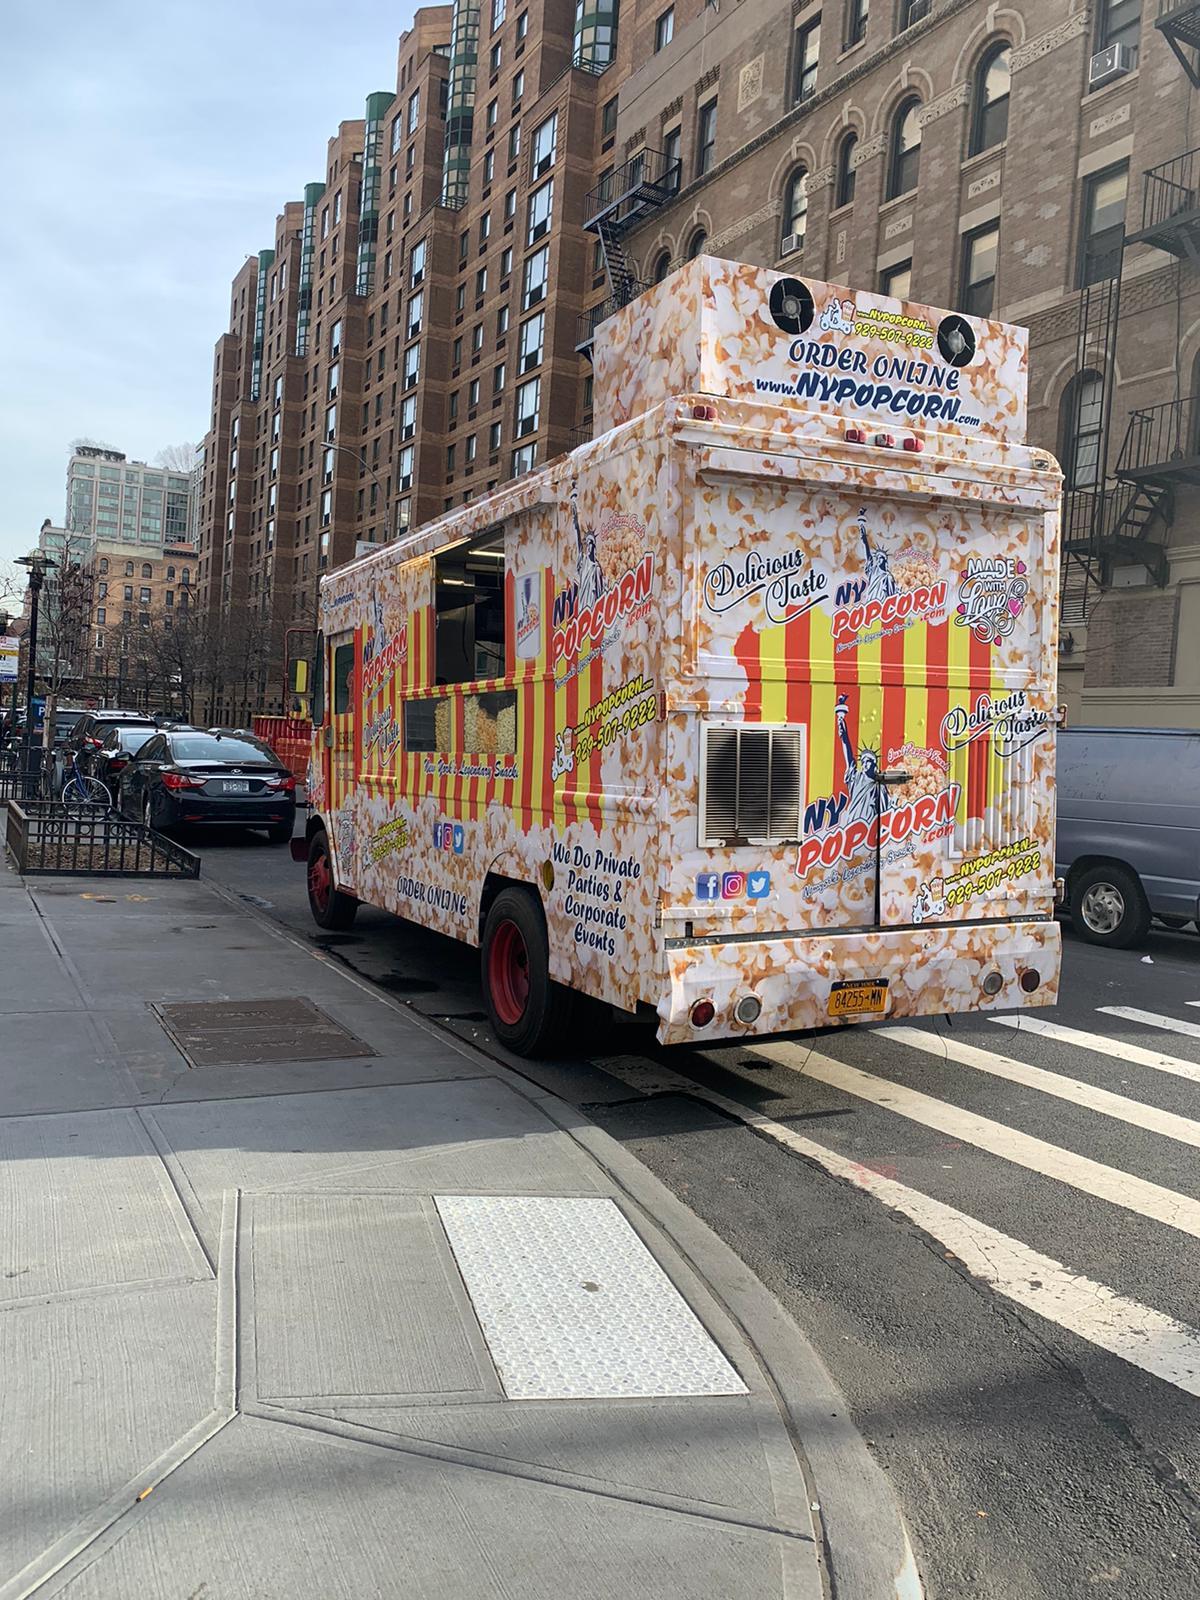 NY Popcorn Food Truck Catering